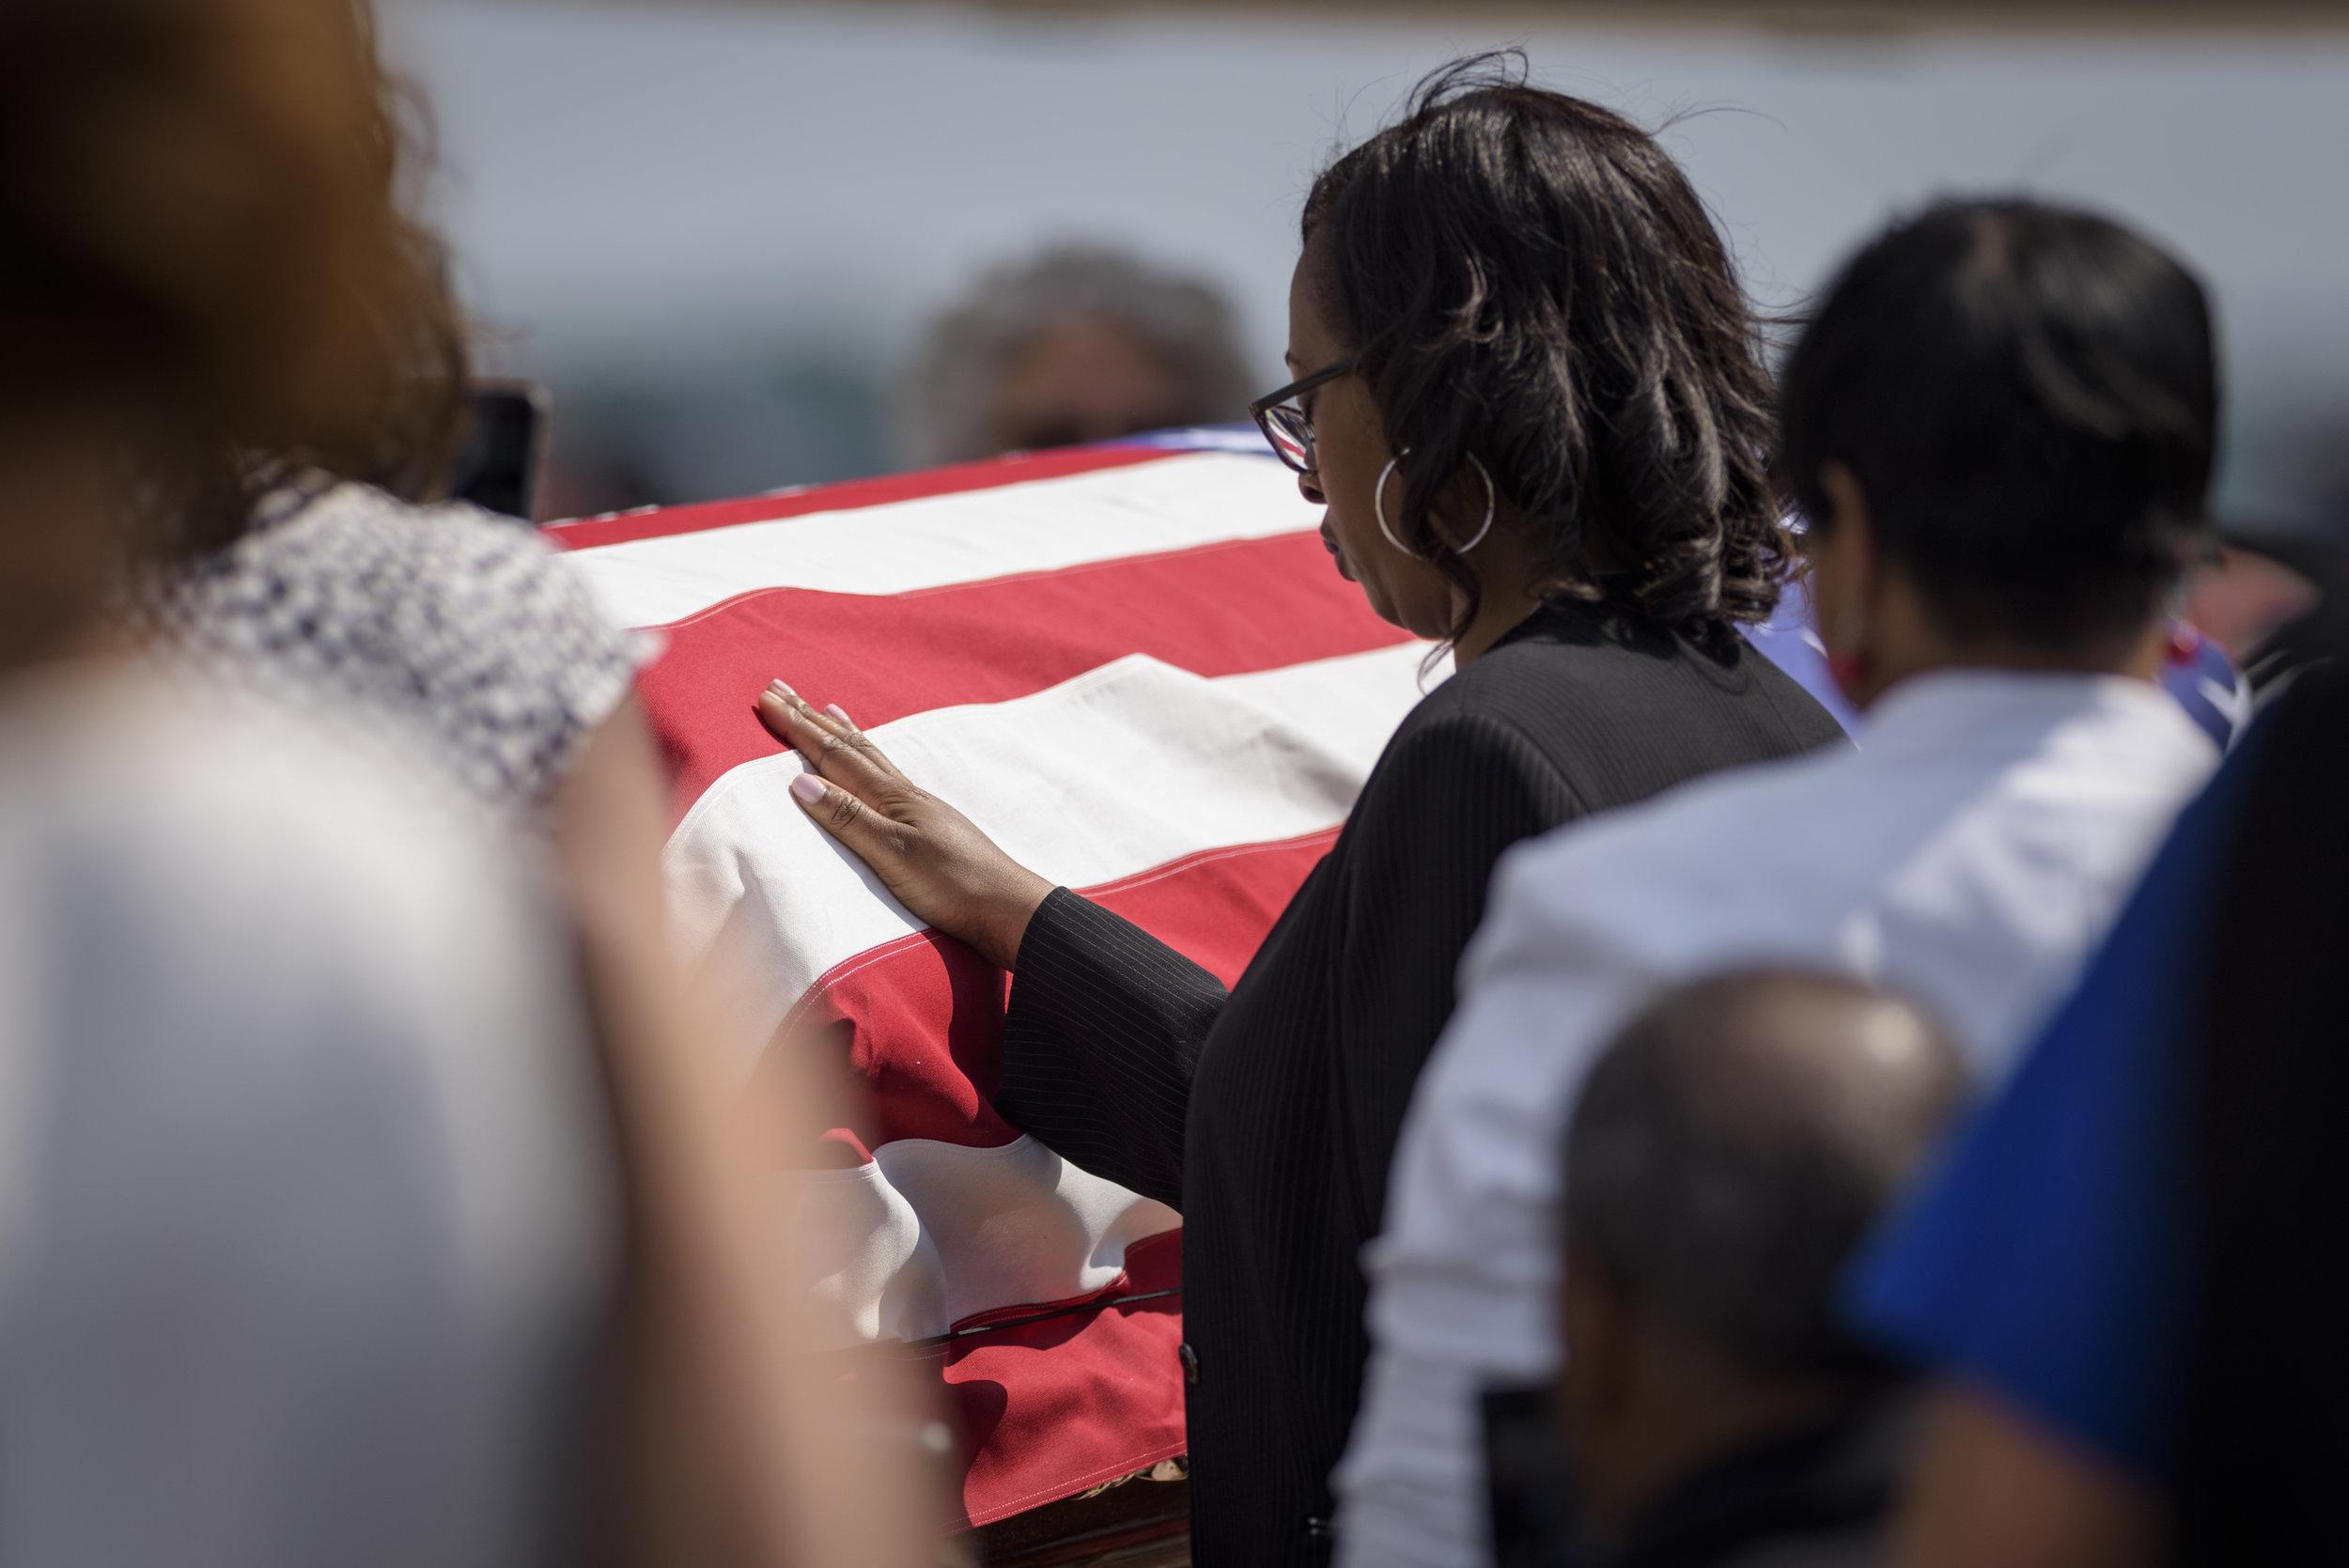 Family members of Army Pfc. William H. Jones commemorate him at RDU Airport in Raleigh, NC on June 20, 2019.